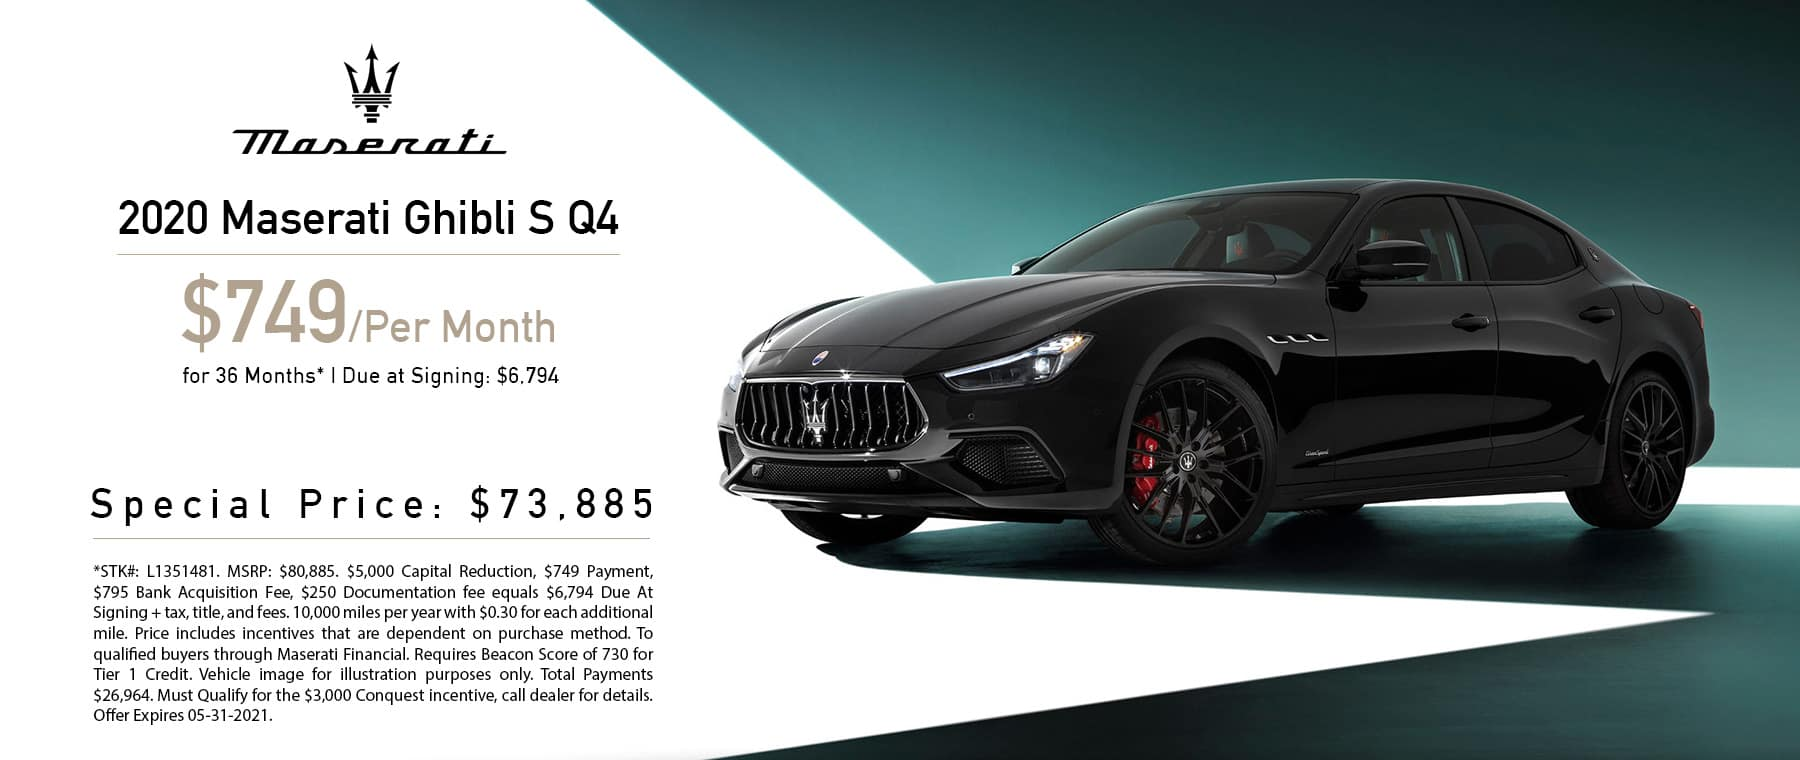 Maserati_2021_Ghibli_Slide_May2021_1